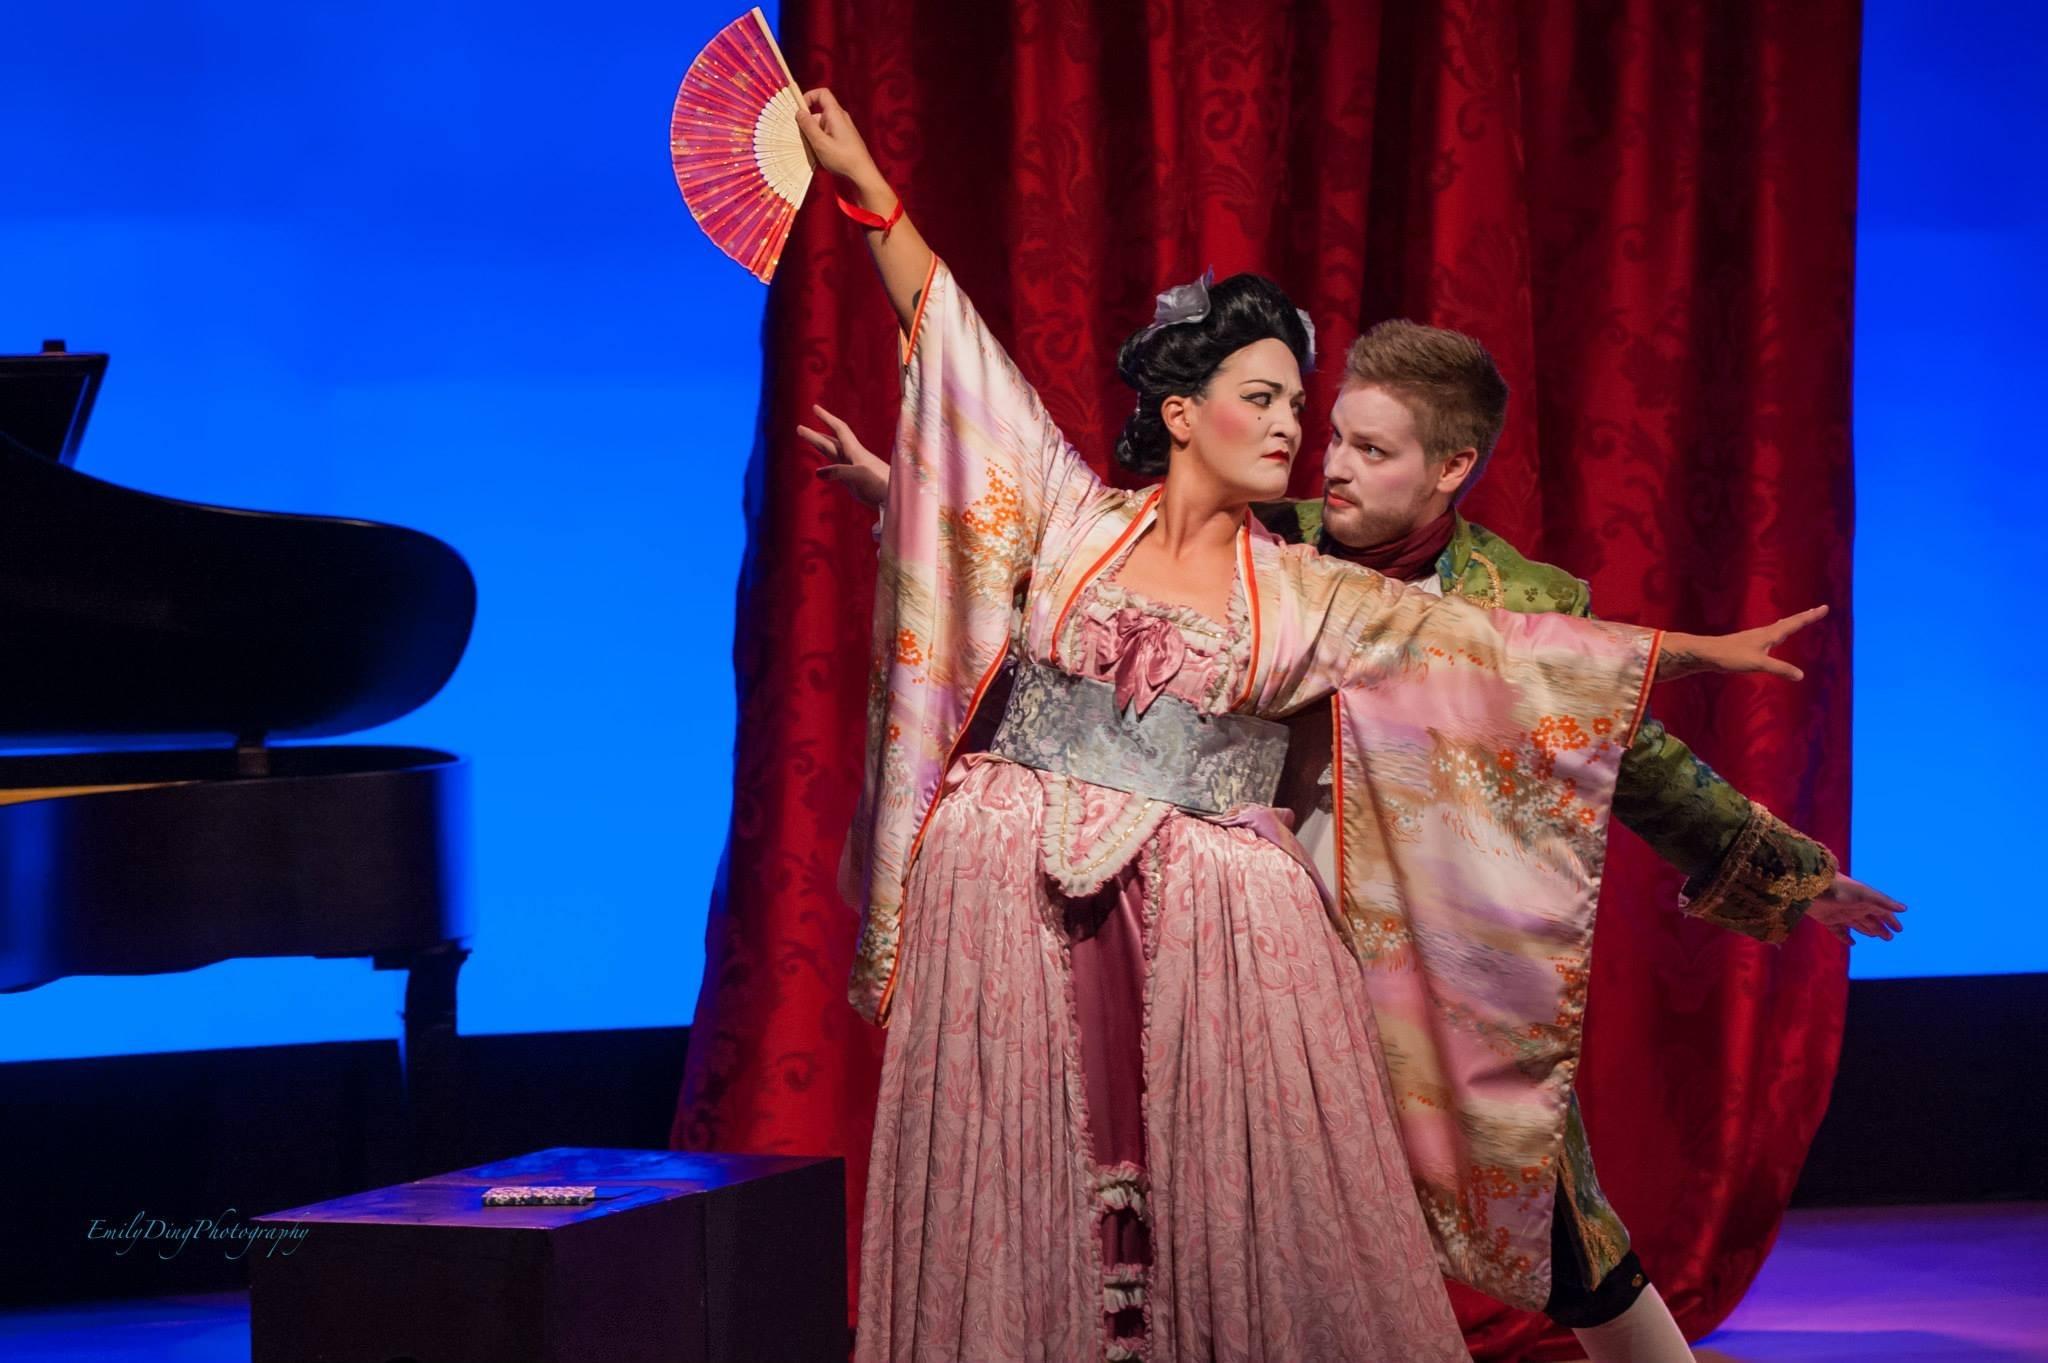 Teiya Kasahara and Justin Ralph in Opera 5's  Bataclan  (Offenbach), Sep 2013. Photo credit: Emily Ding.